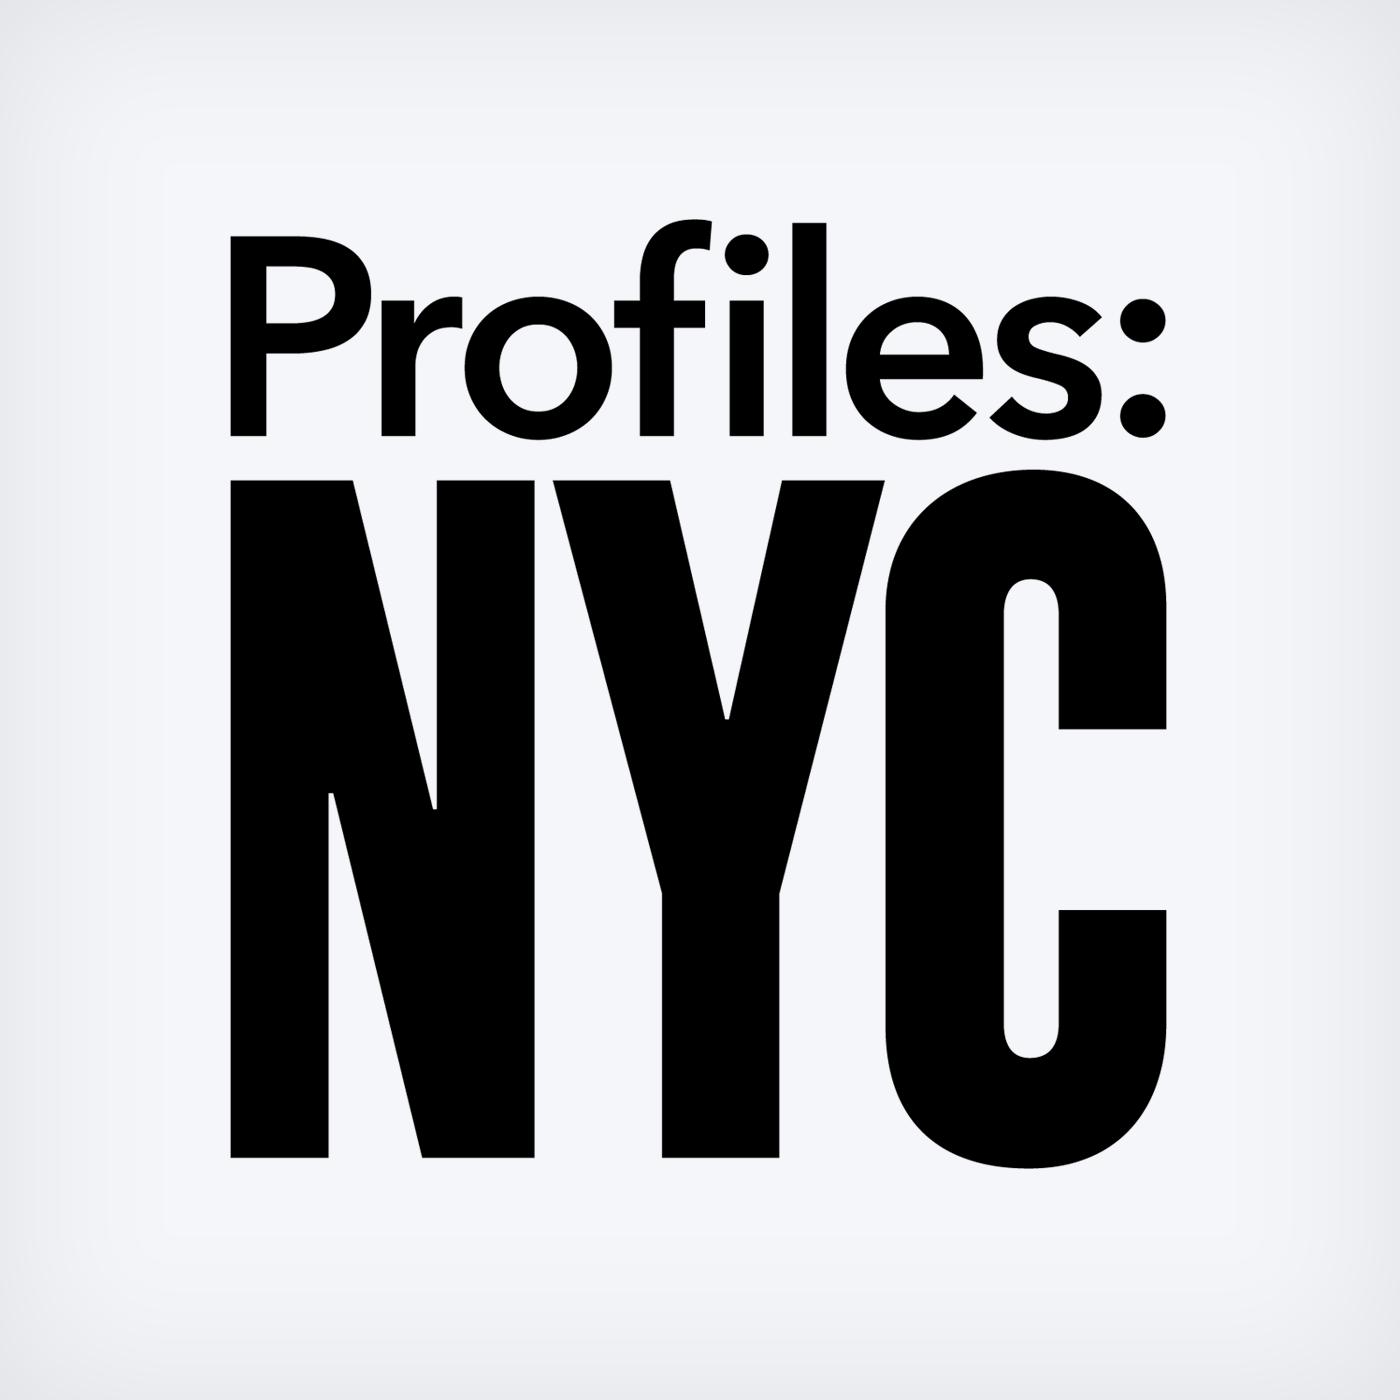 Profiles:NYC